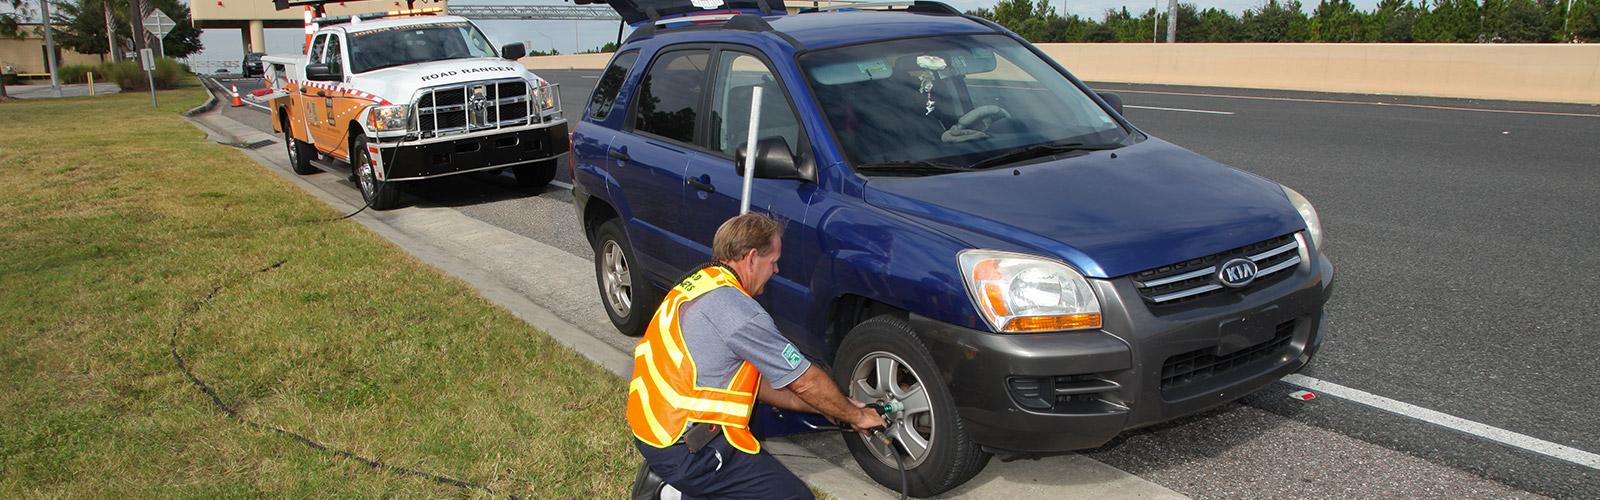 Road Ranger roadside assistance fixing a tire along expressway